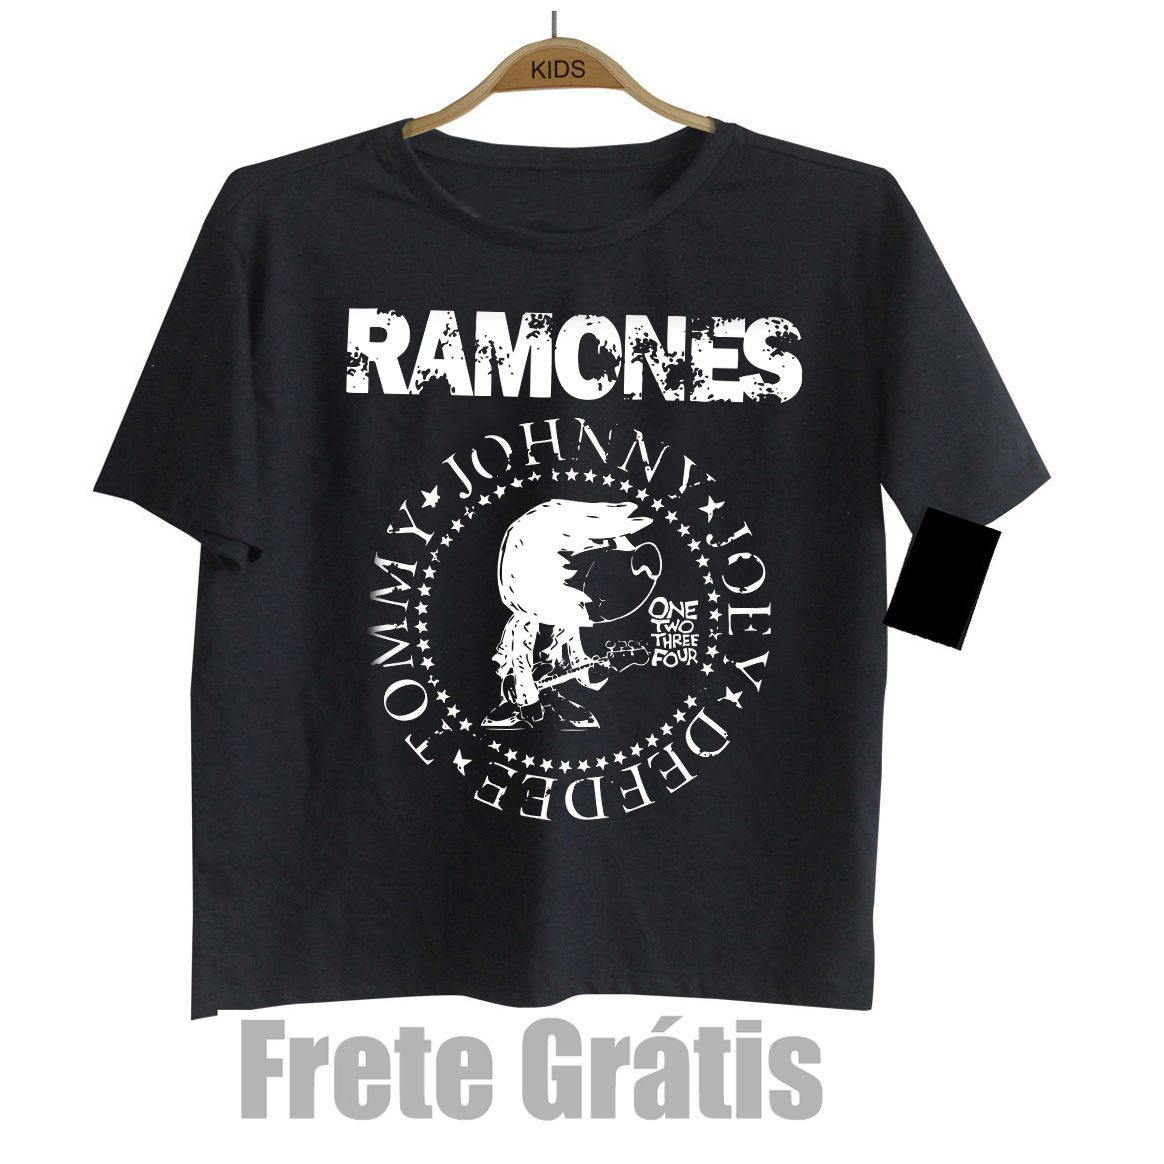 Camiseta Infantil de Rock do RAMONES - Black  - Baby Monster S/A